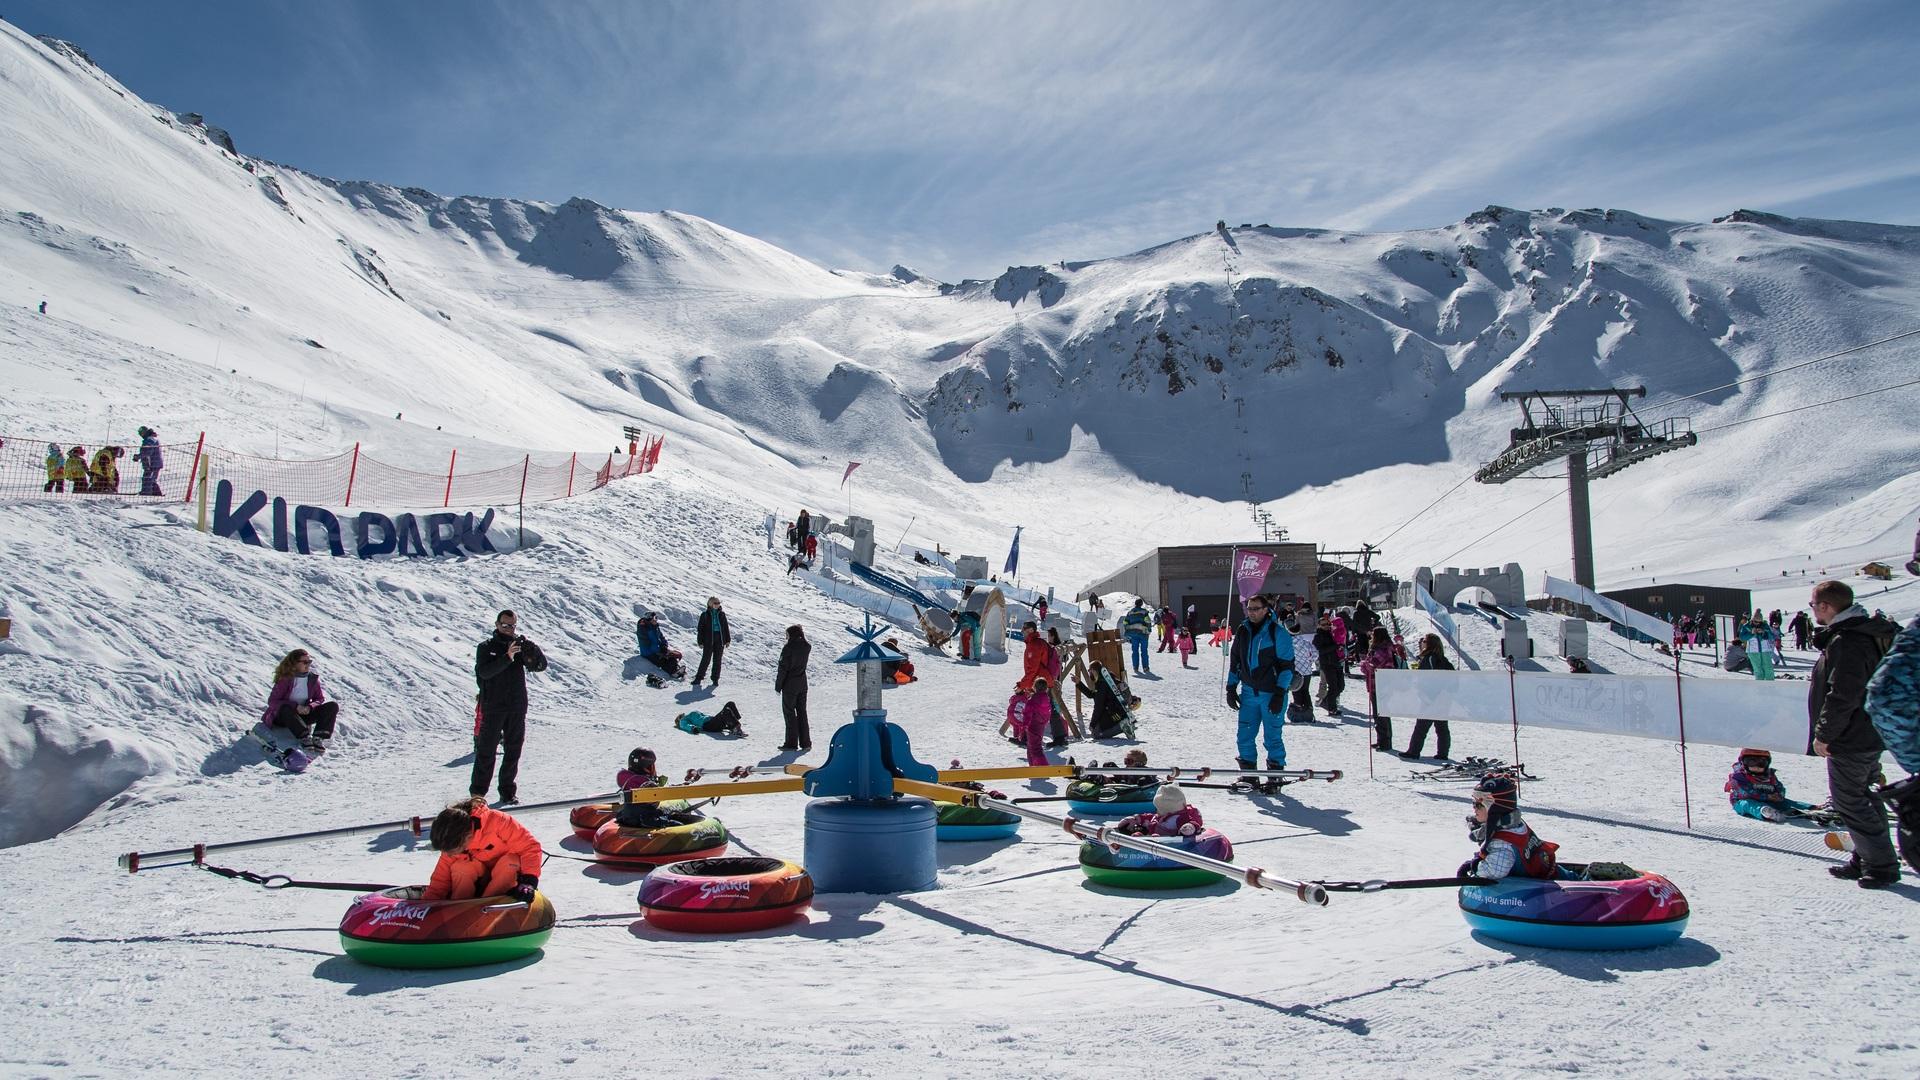 Domaine skiable Valfréjus, kid park